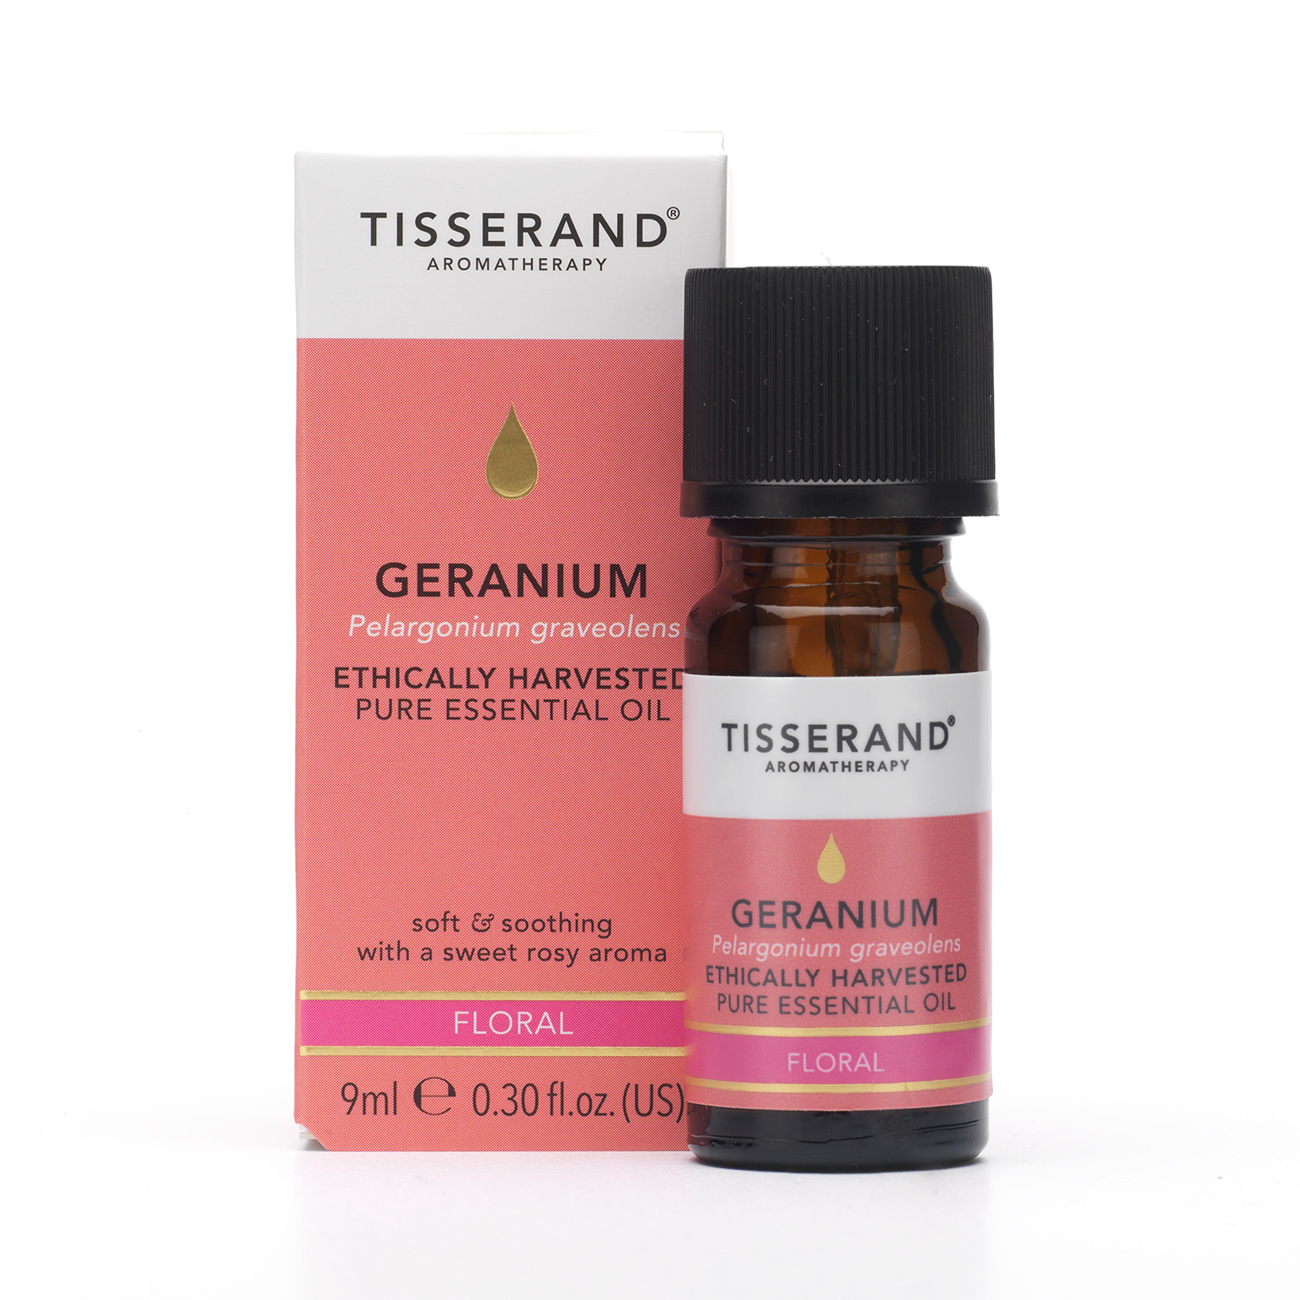 Geranium Ethically Harvested Pure Essential Oil 9ml